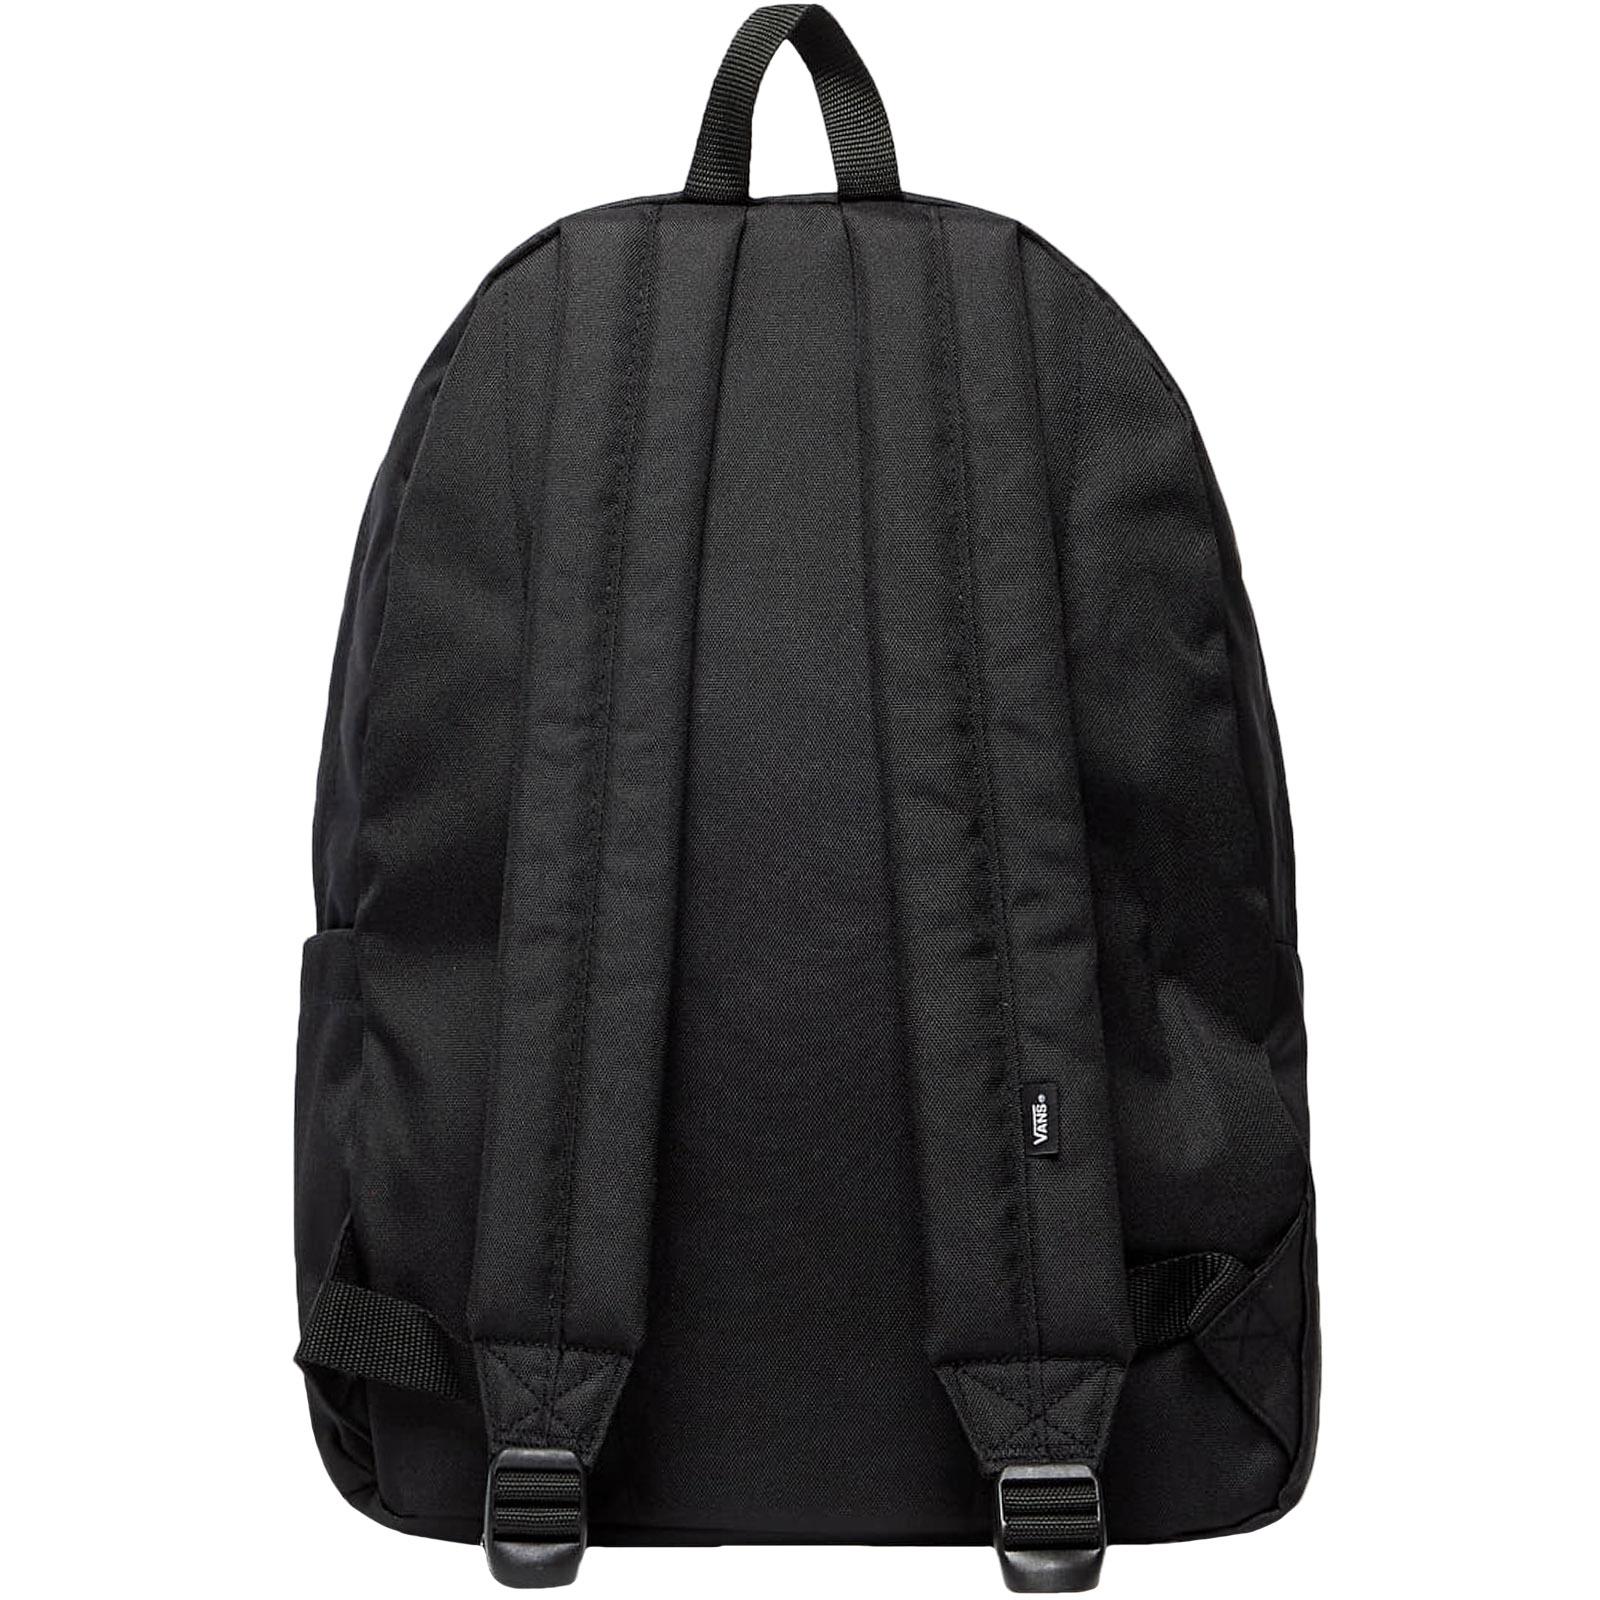 thumbnail 3 - Vans Unisex Old Skool Drop Adjustable Strap School Travel Rucksack Backpack Bag